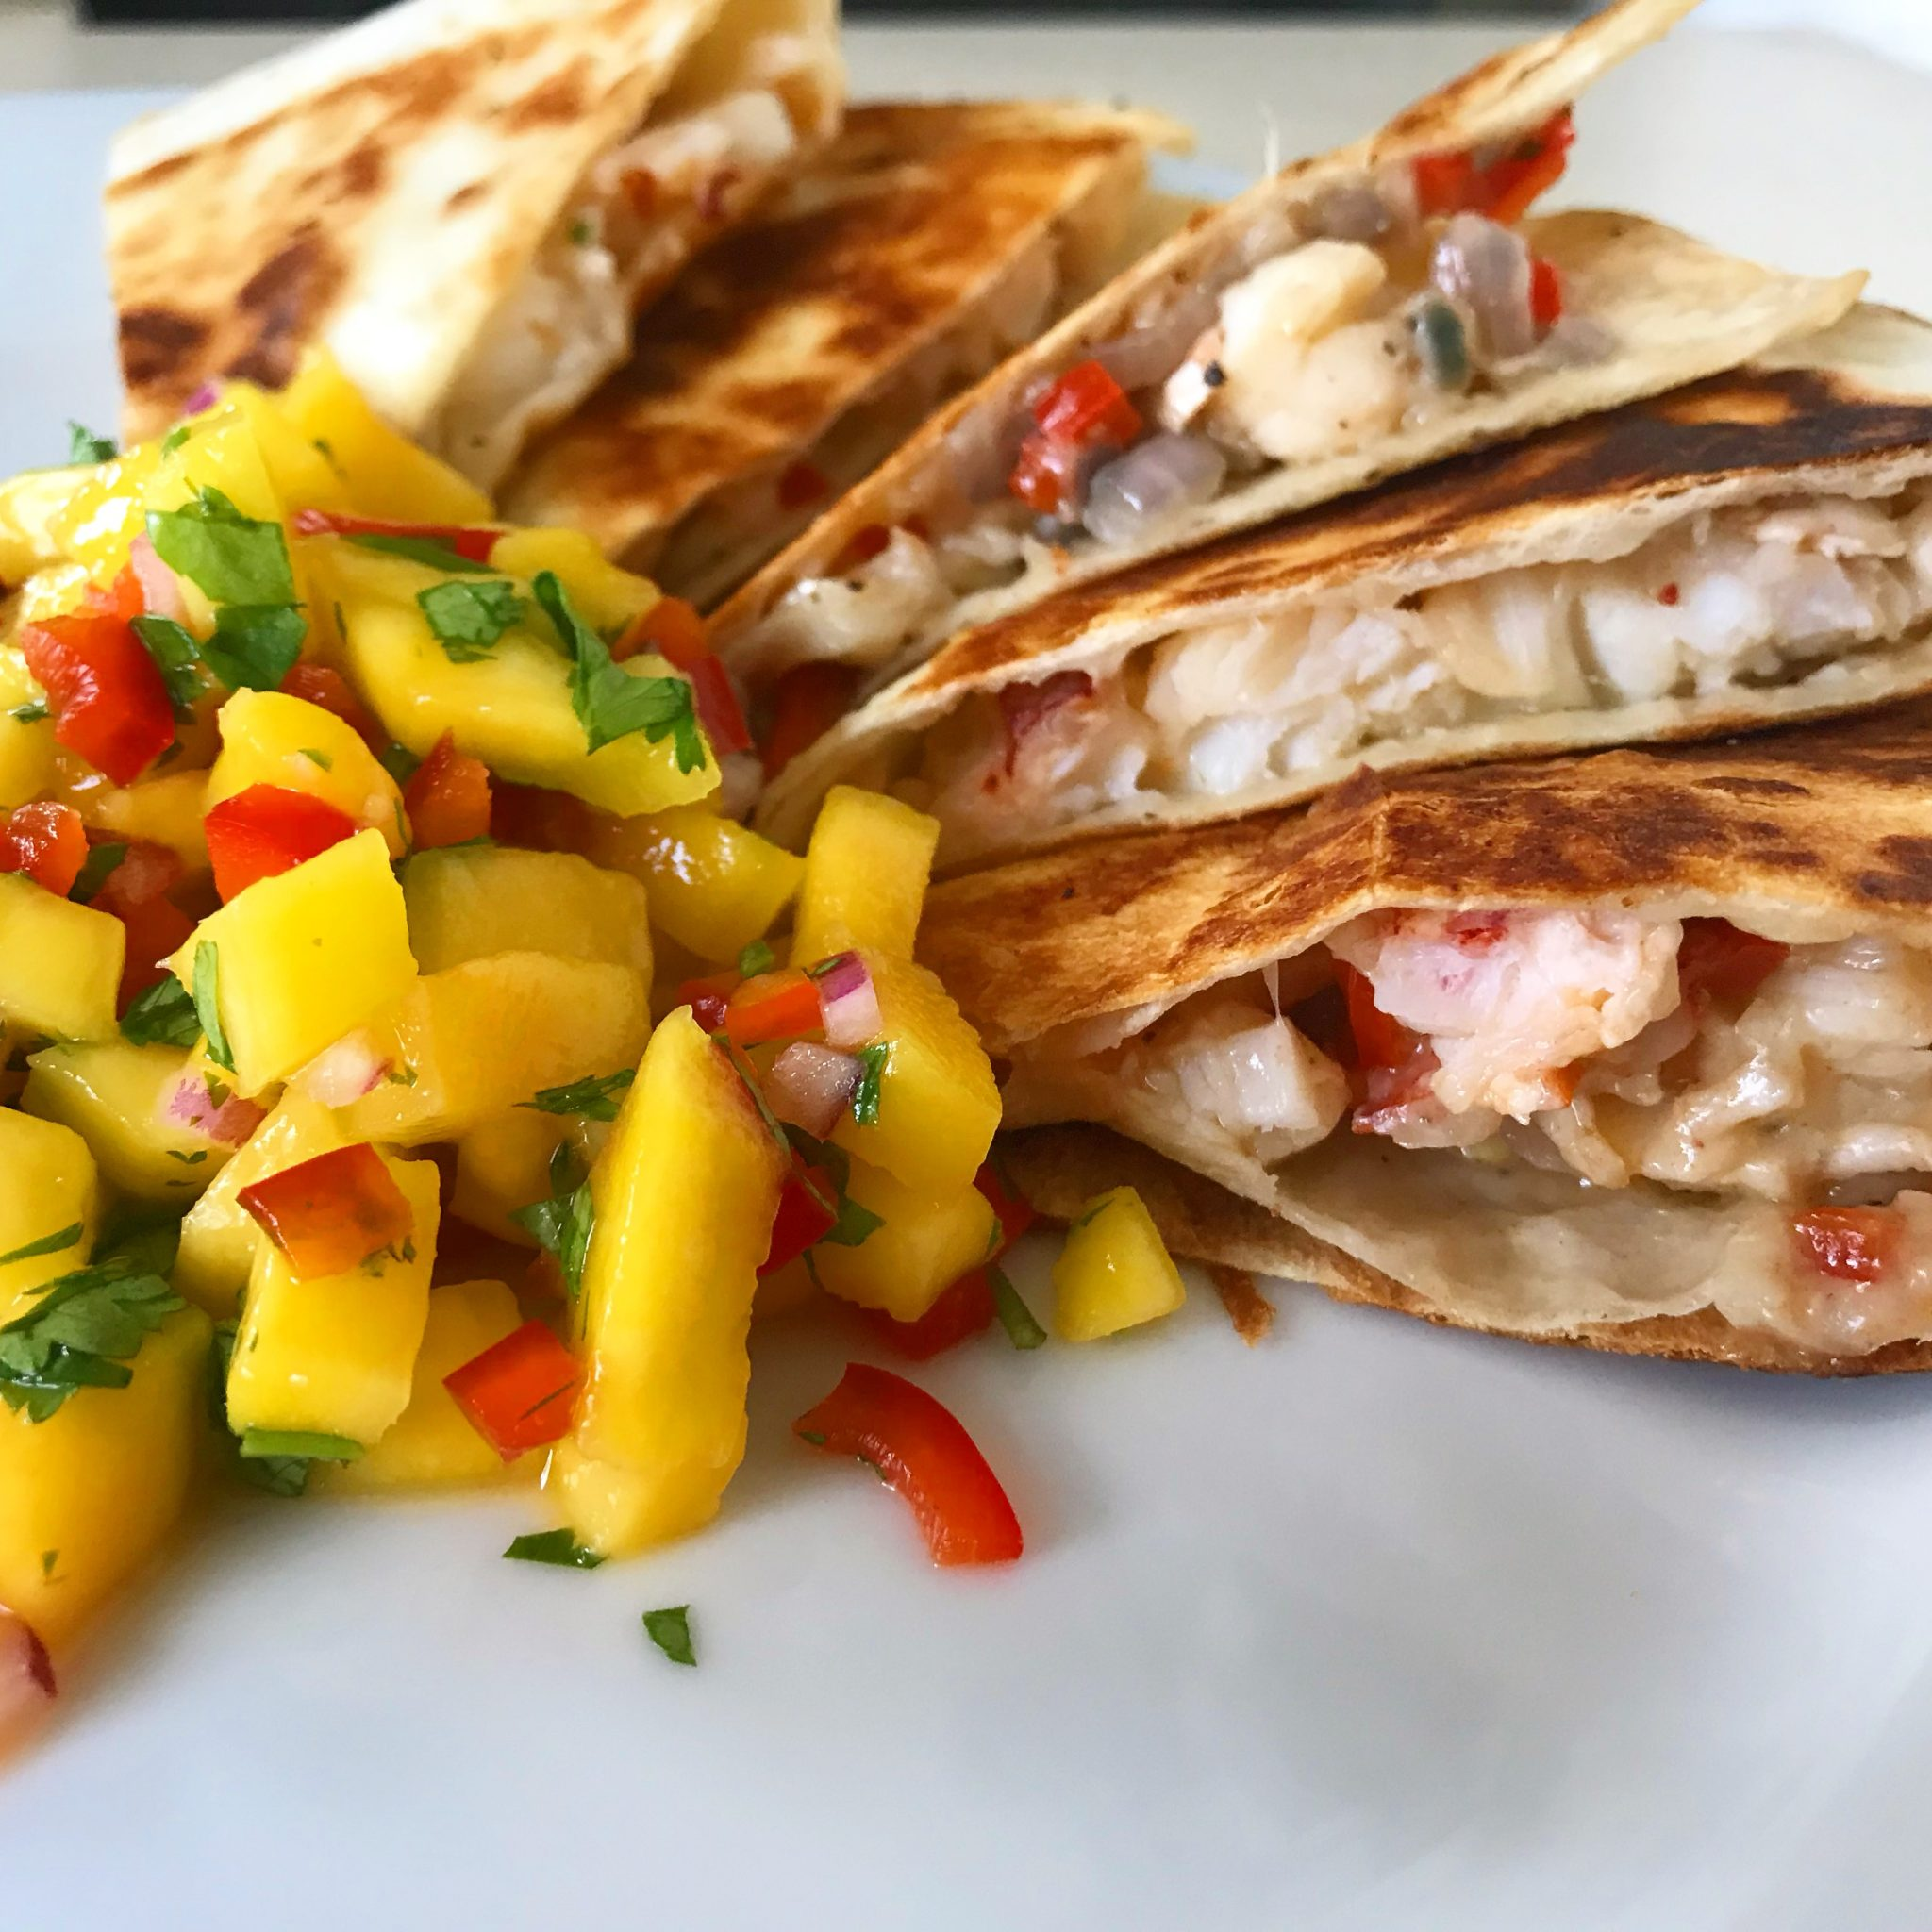 Lobster Quesadilla with Mango Salsa